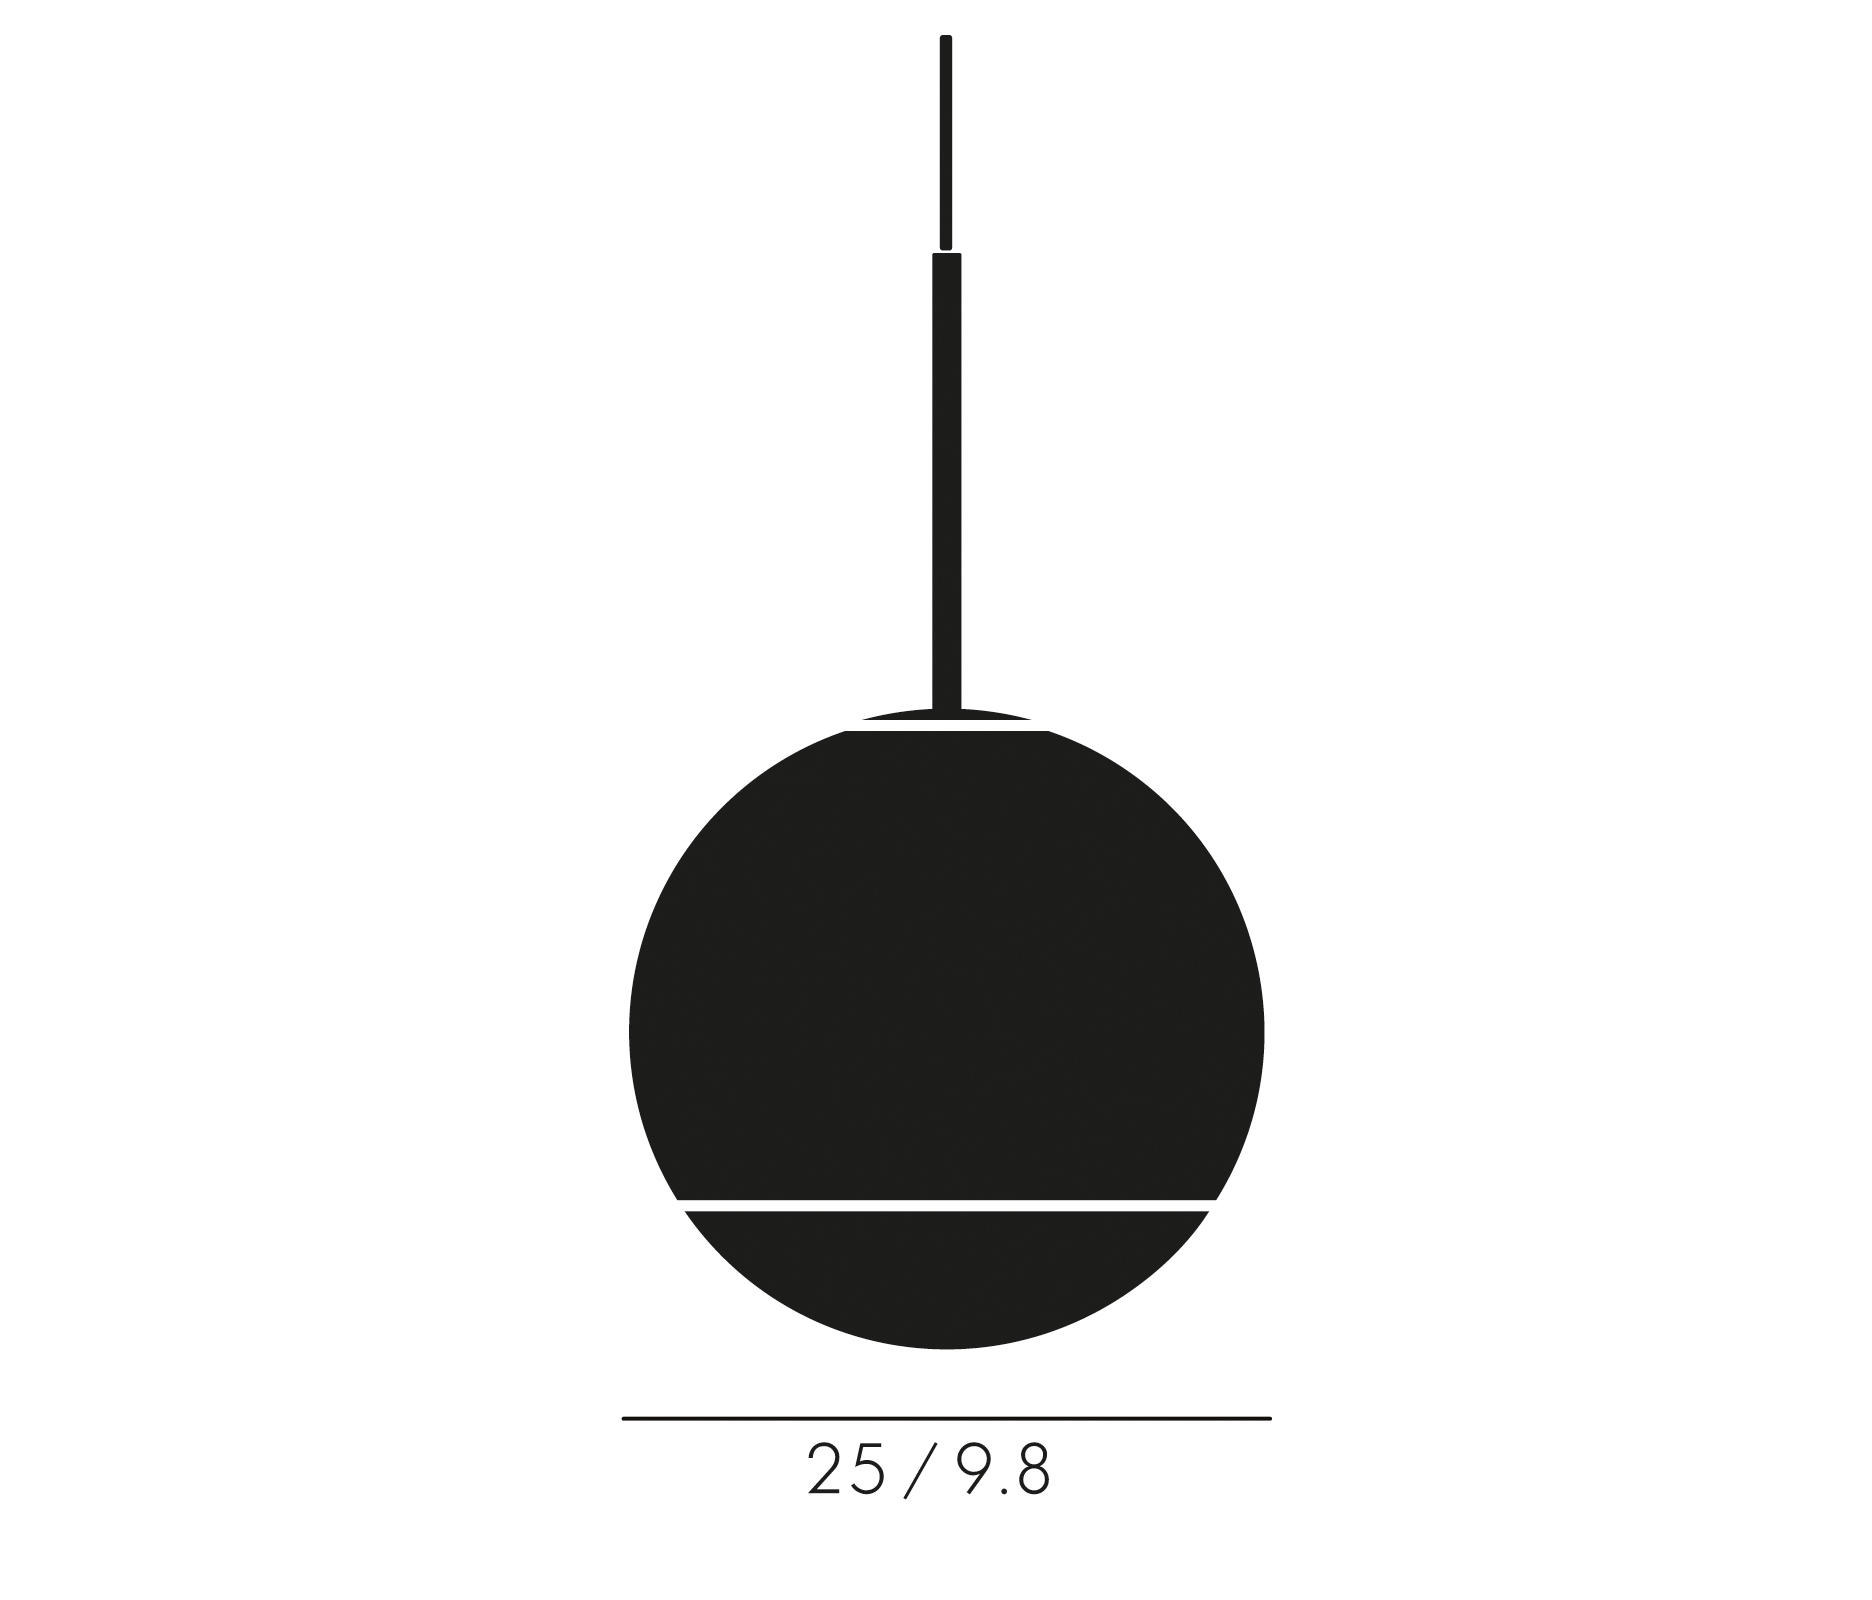 Mirror ball pendant gold 25cm general lighting from tom dixon mirror ball pendant gold 25cm by tom dixon general lighting mozeypictures Choice Image